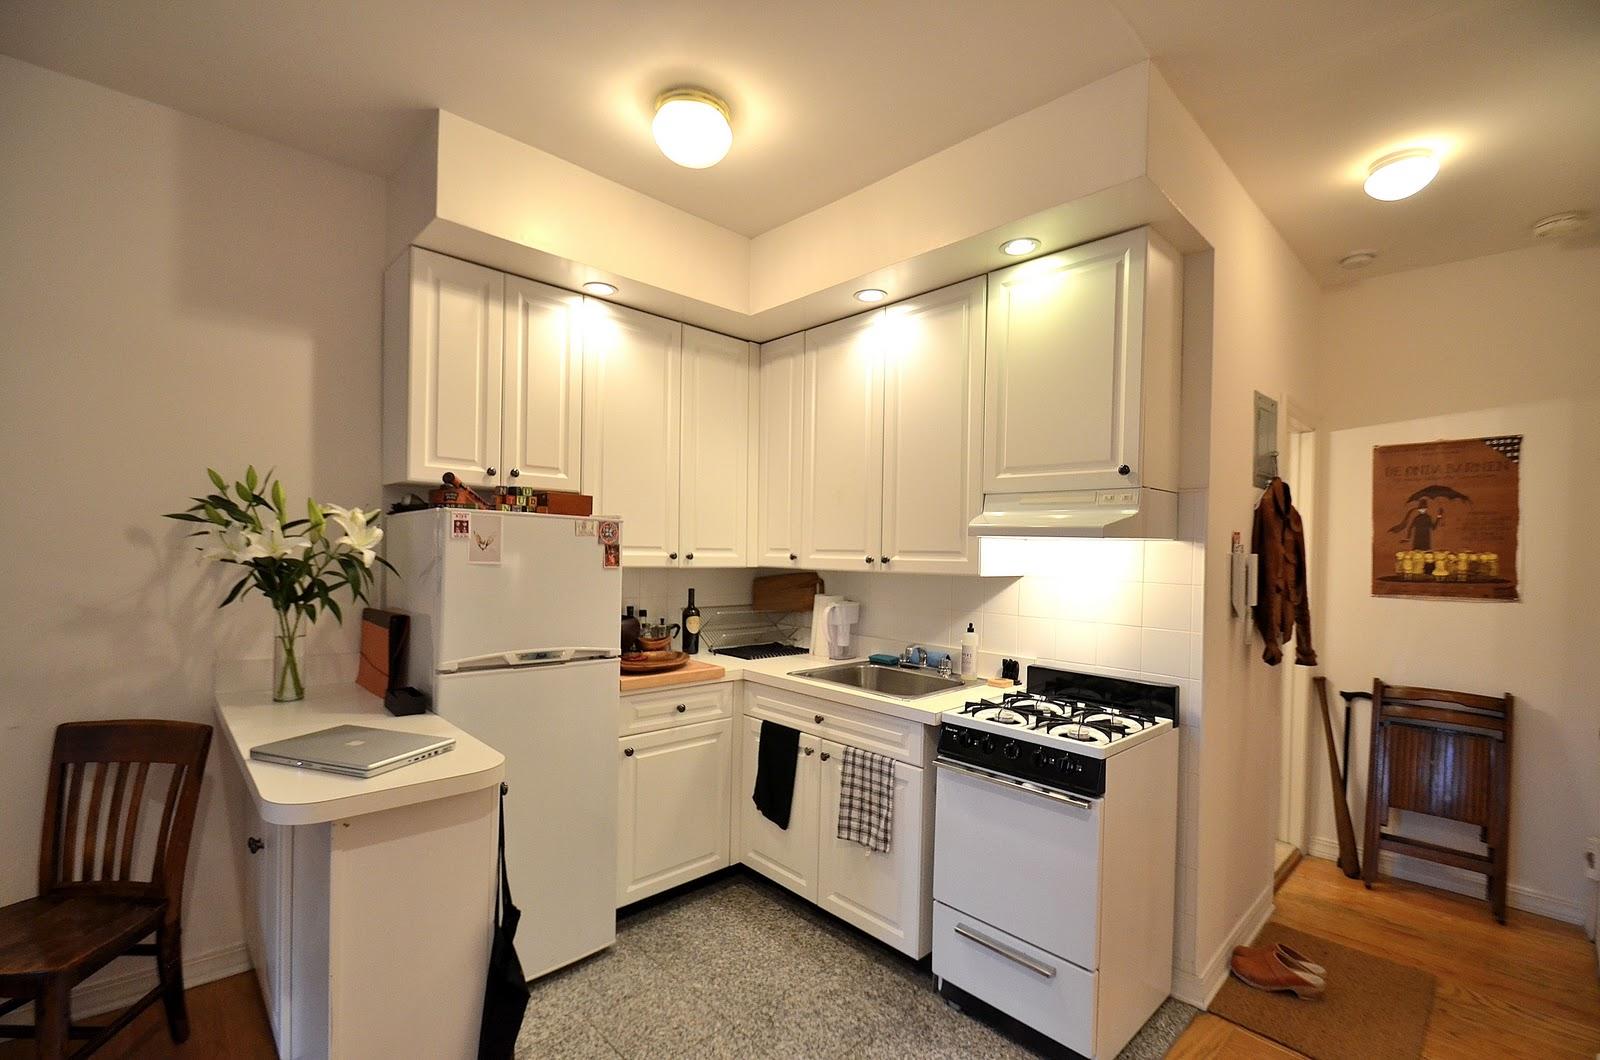 Unique and tiny white apartment kitchen set